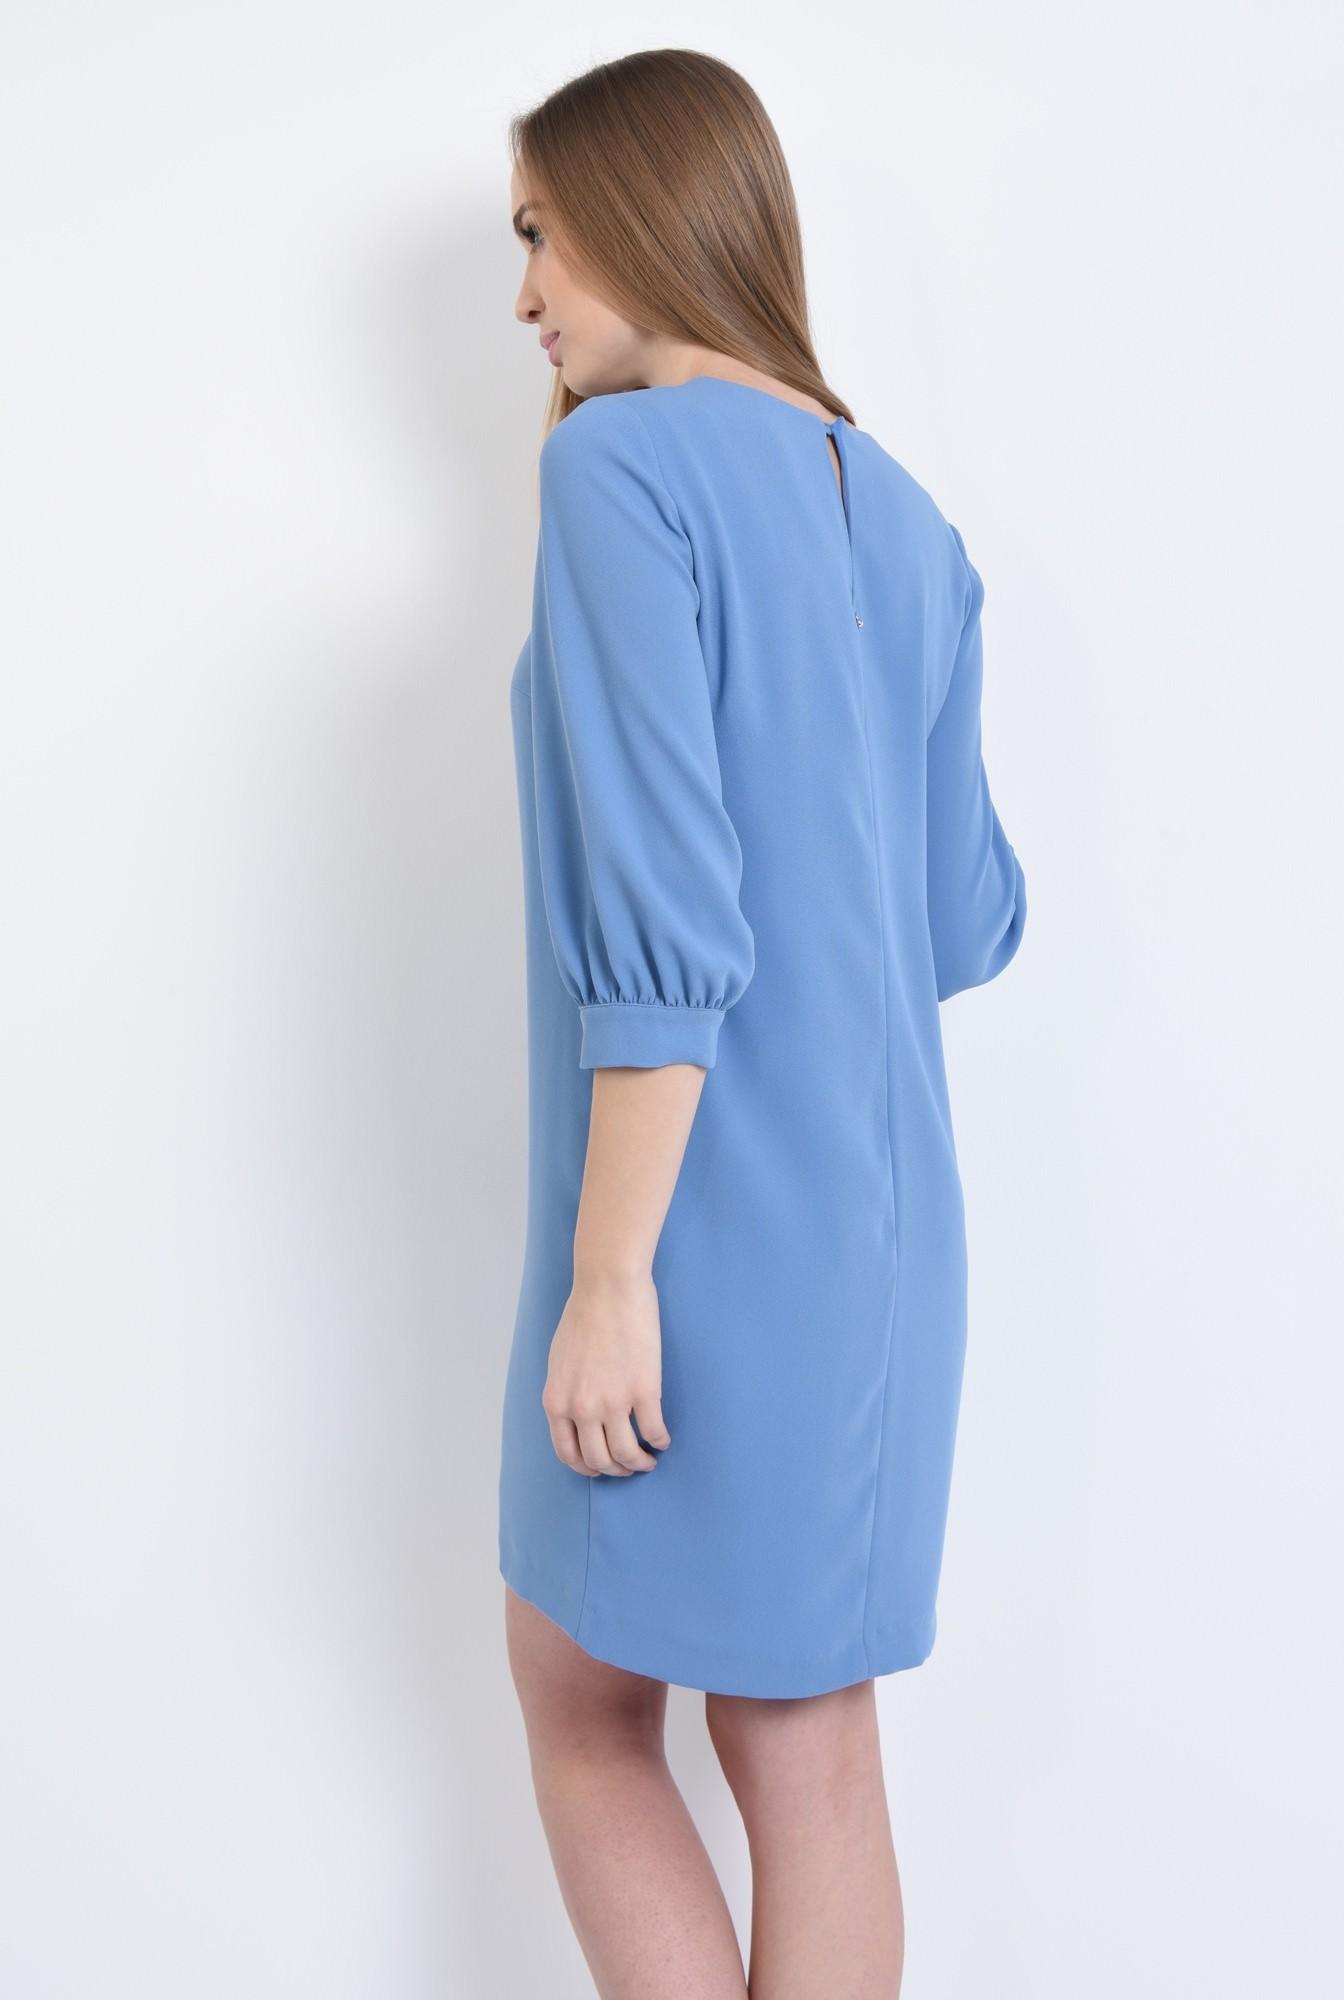 1 - Rochie casual, bleu